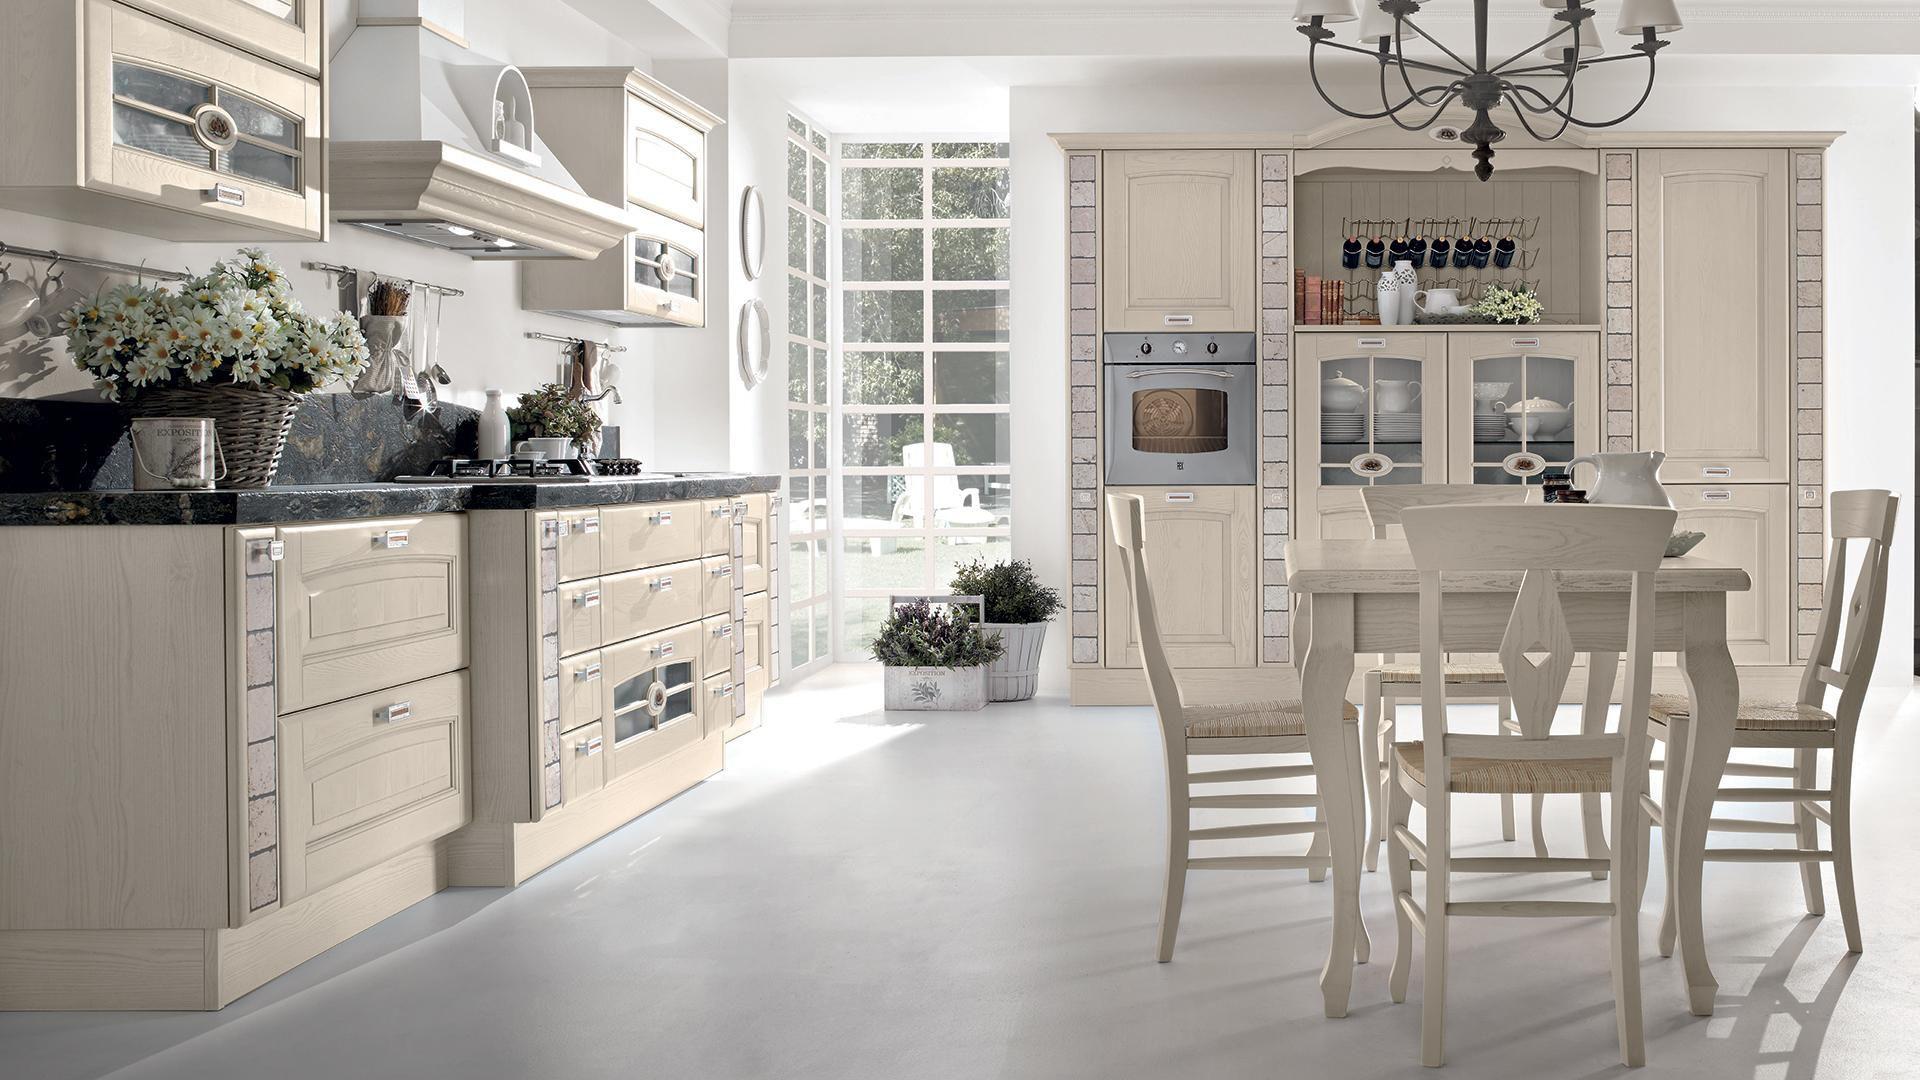 Cucina classica / in legno / con impugnature - VERONICA - CUCINE ...